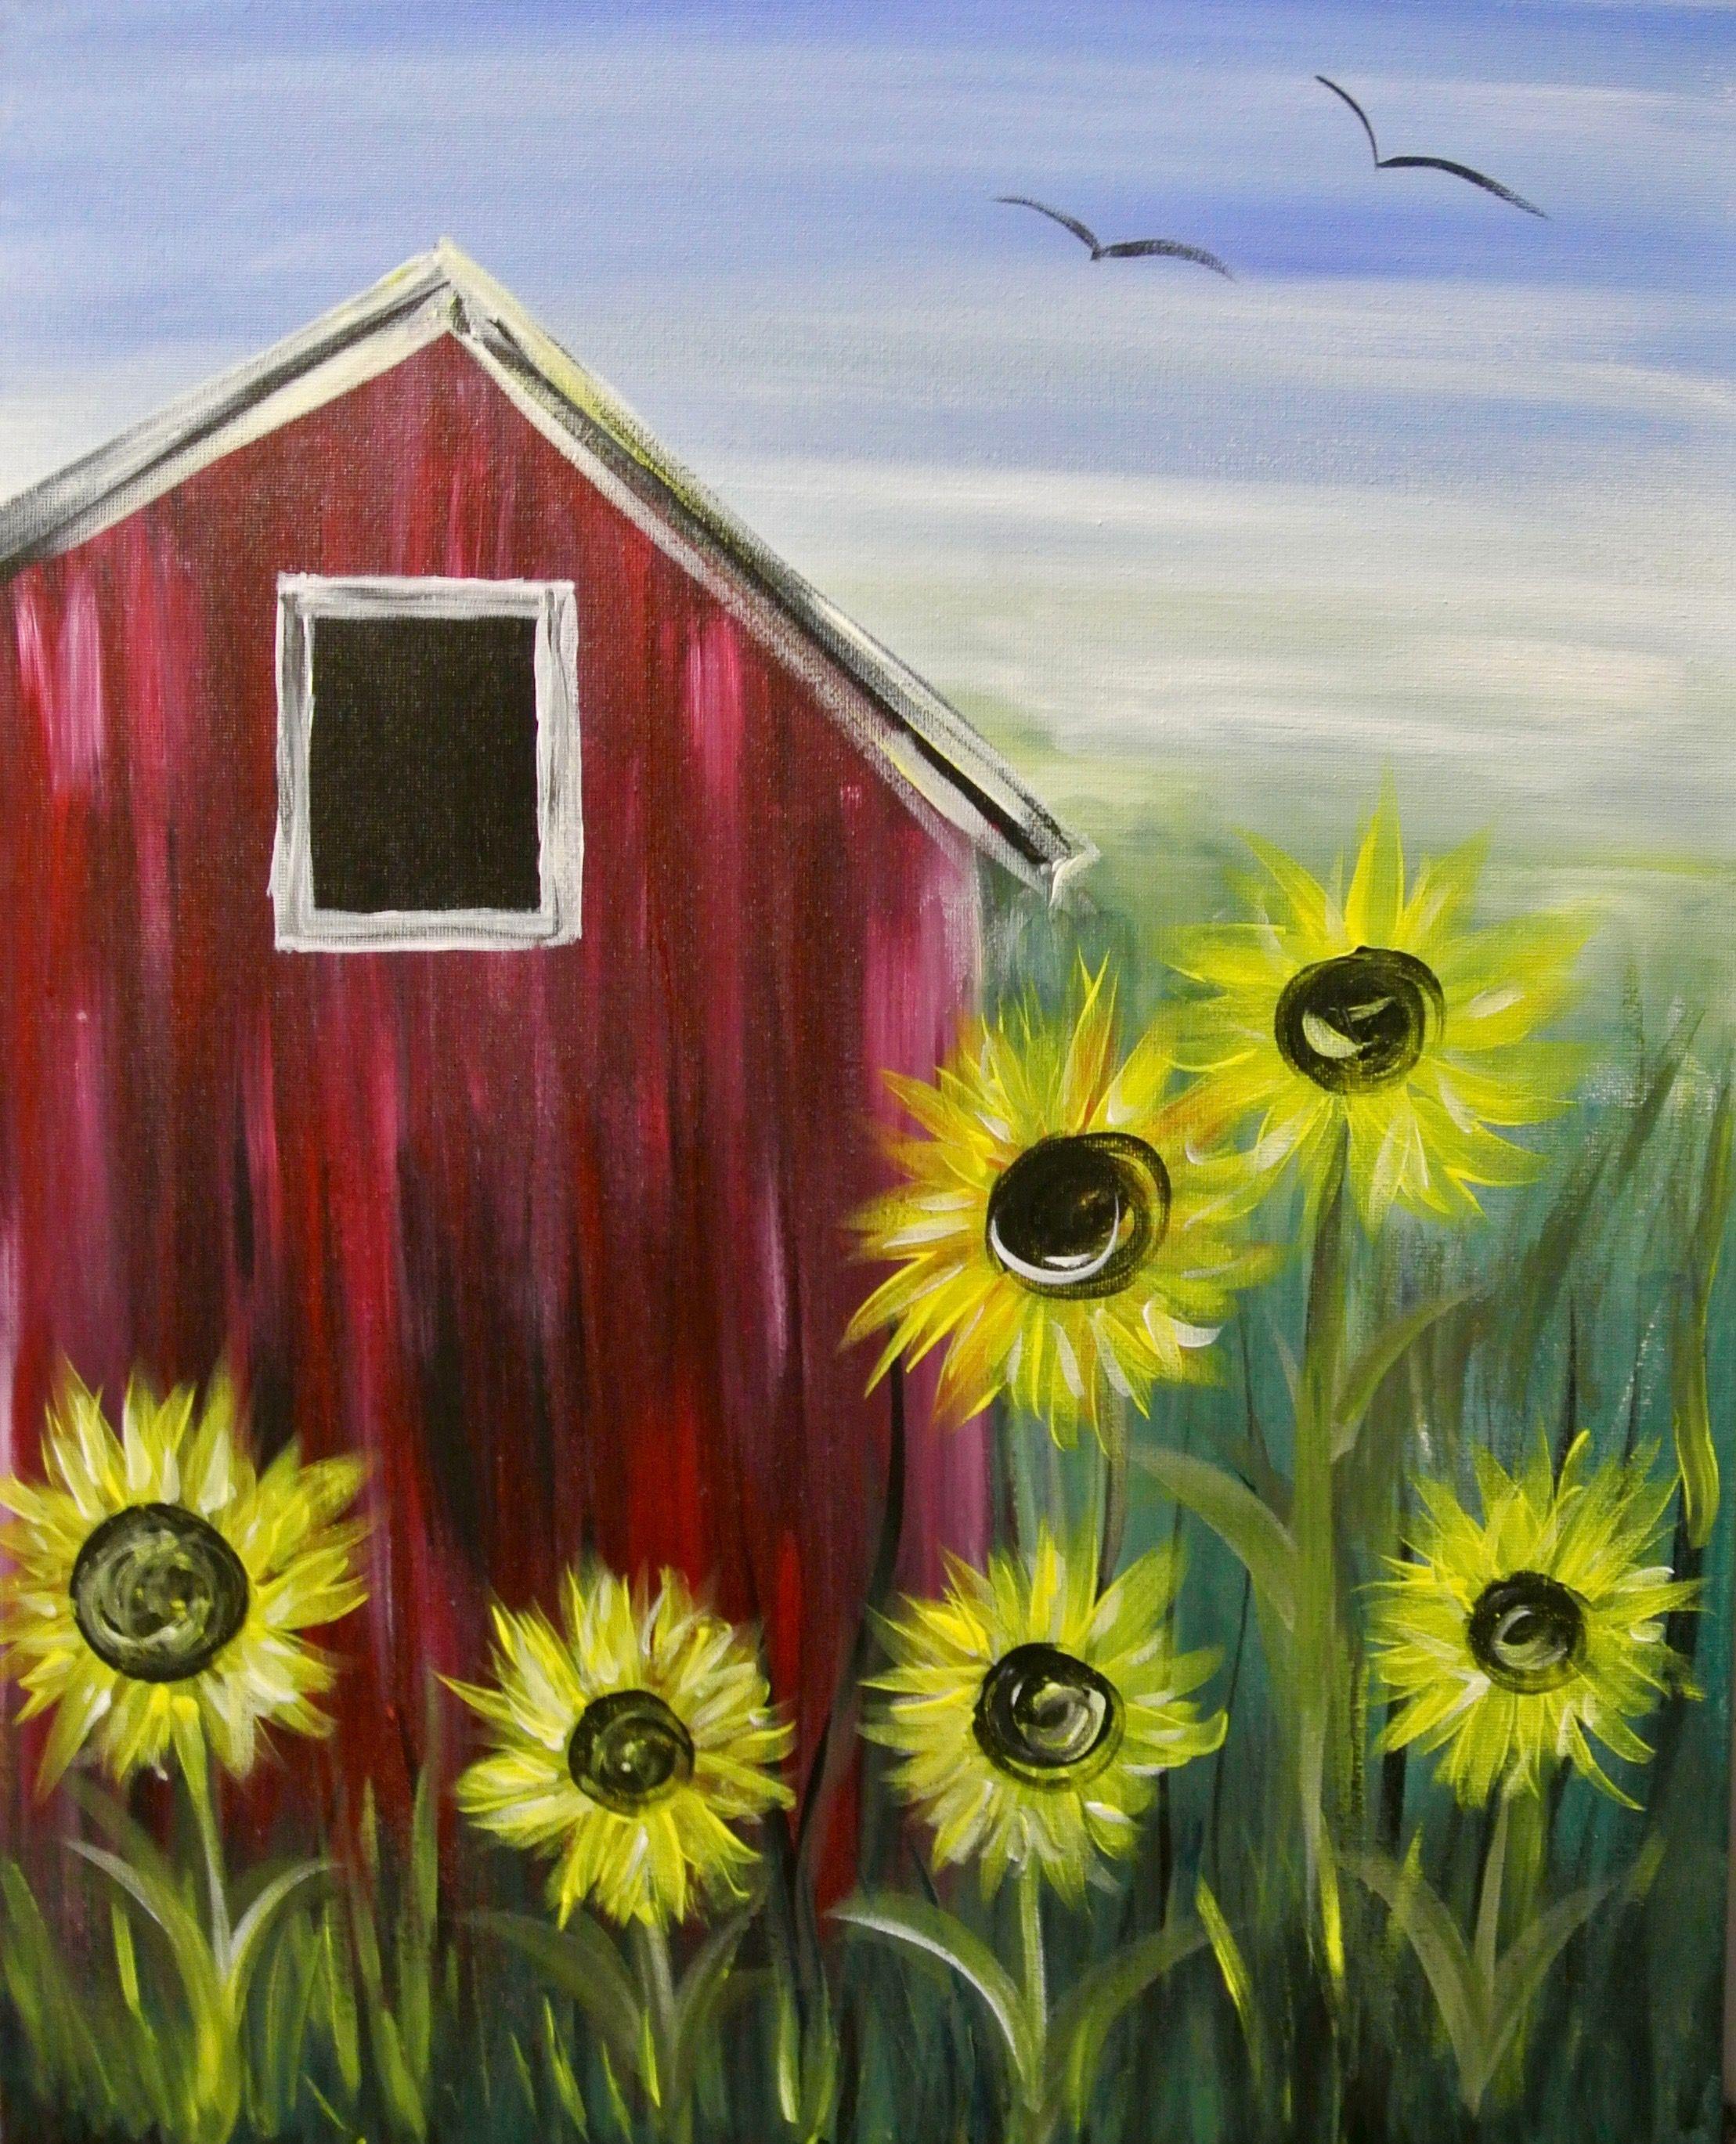 Paint nite sunflower farm creative canvas pinterest sunflowers farming and paintings - Painting ideas ...